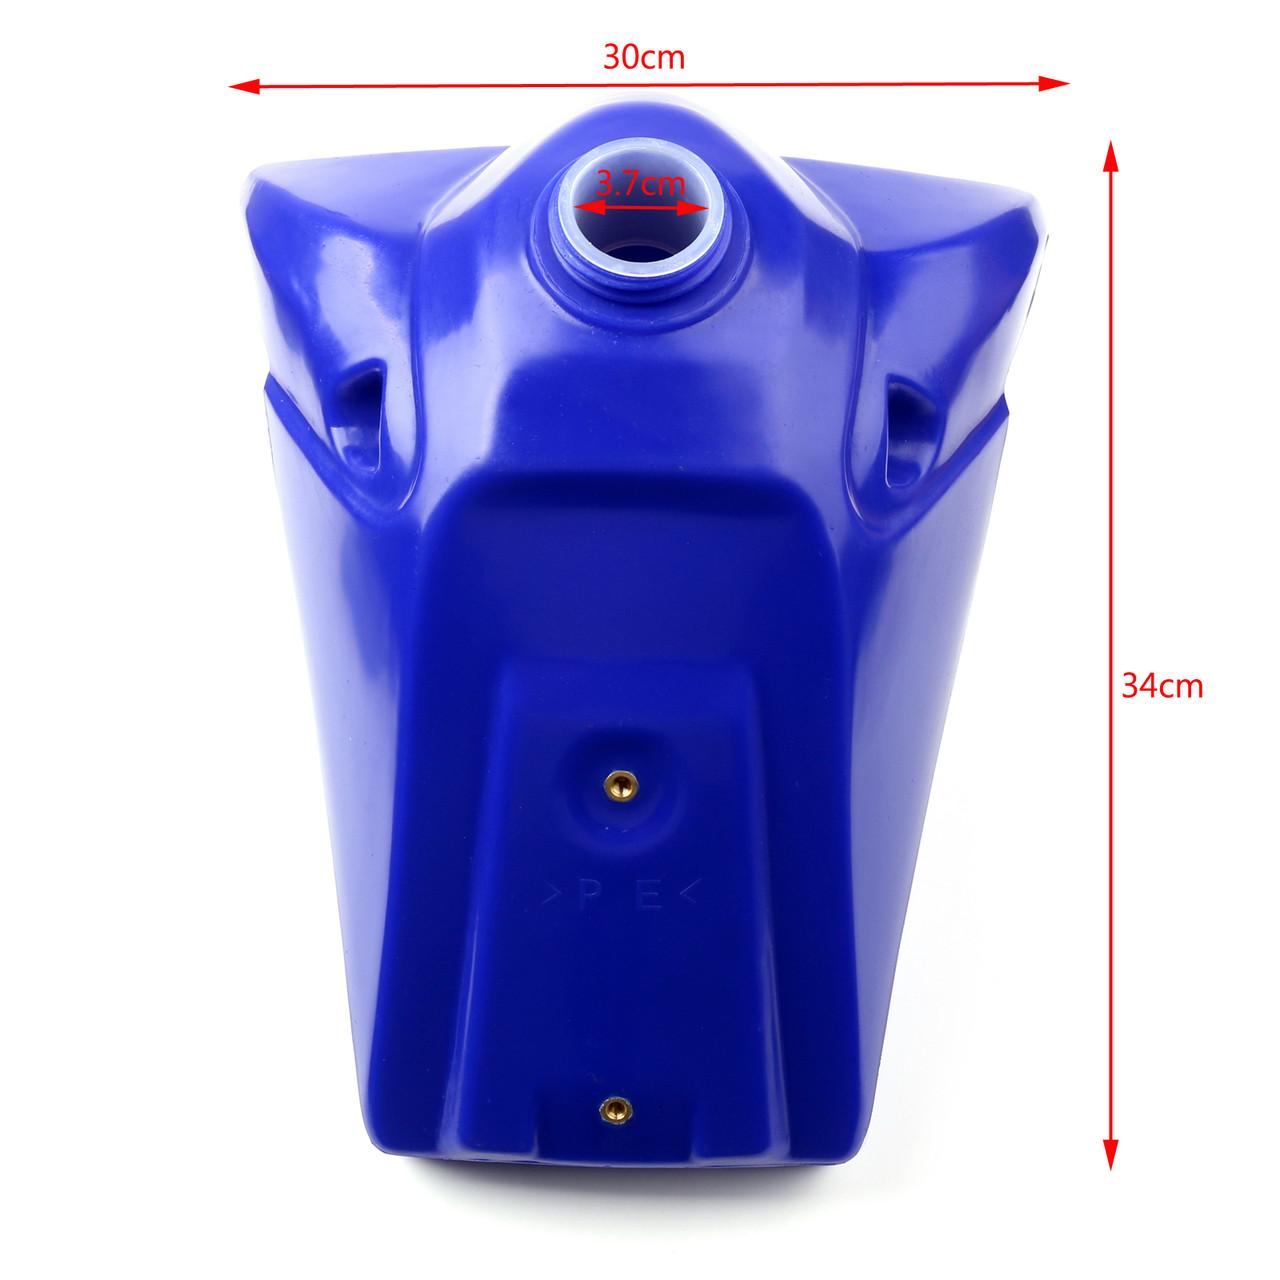 http://www.madhornets.store/AMZ/MotoPart/Fuel%20Gas%20Tank/M557-A001/M557-A001-Blue-2.jpg